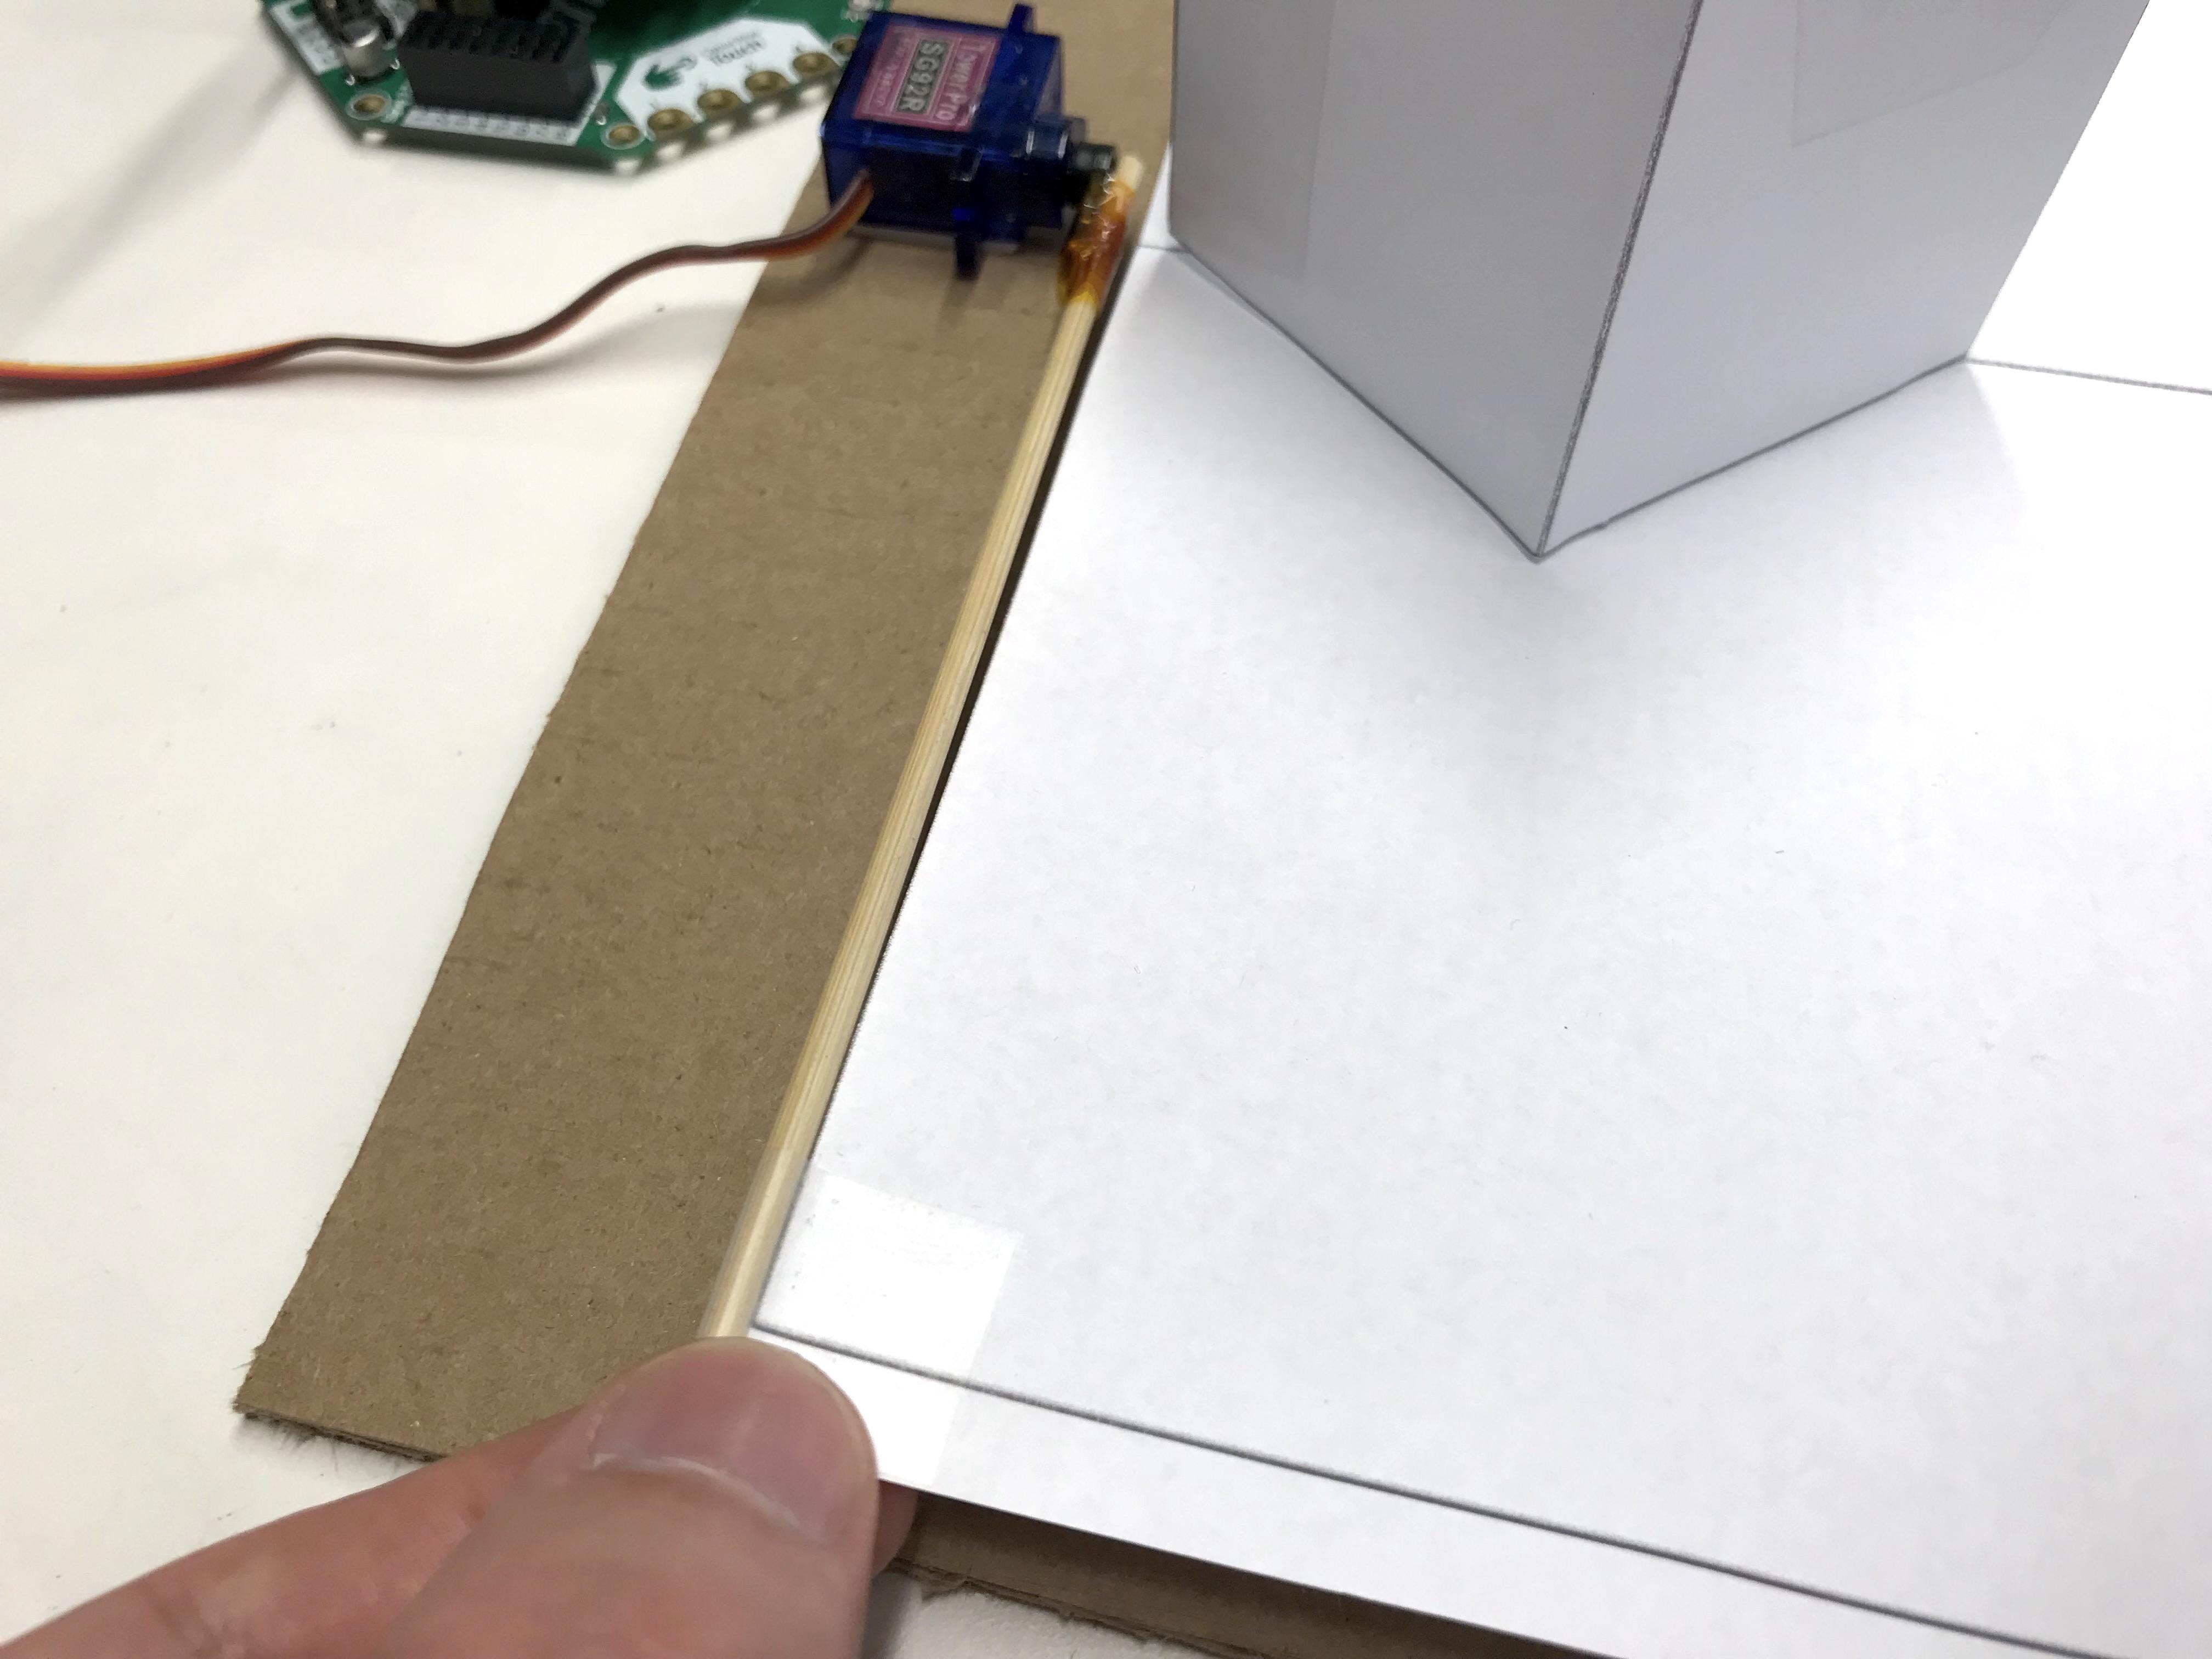 circuitpython_IMG_3426.jpg